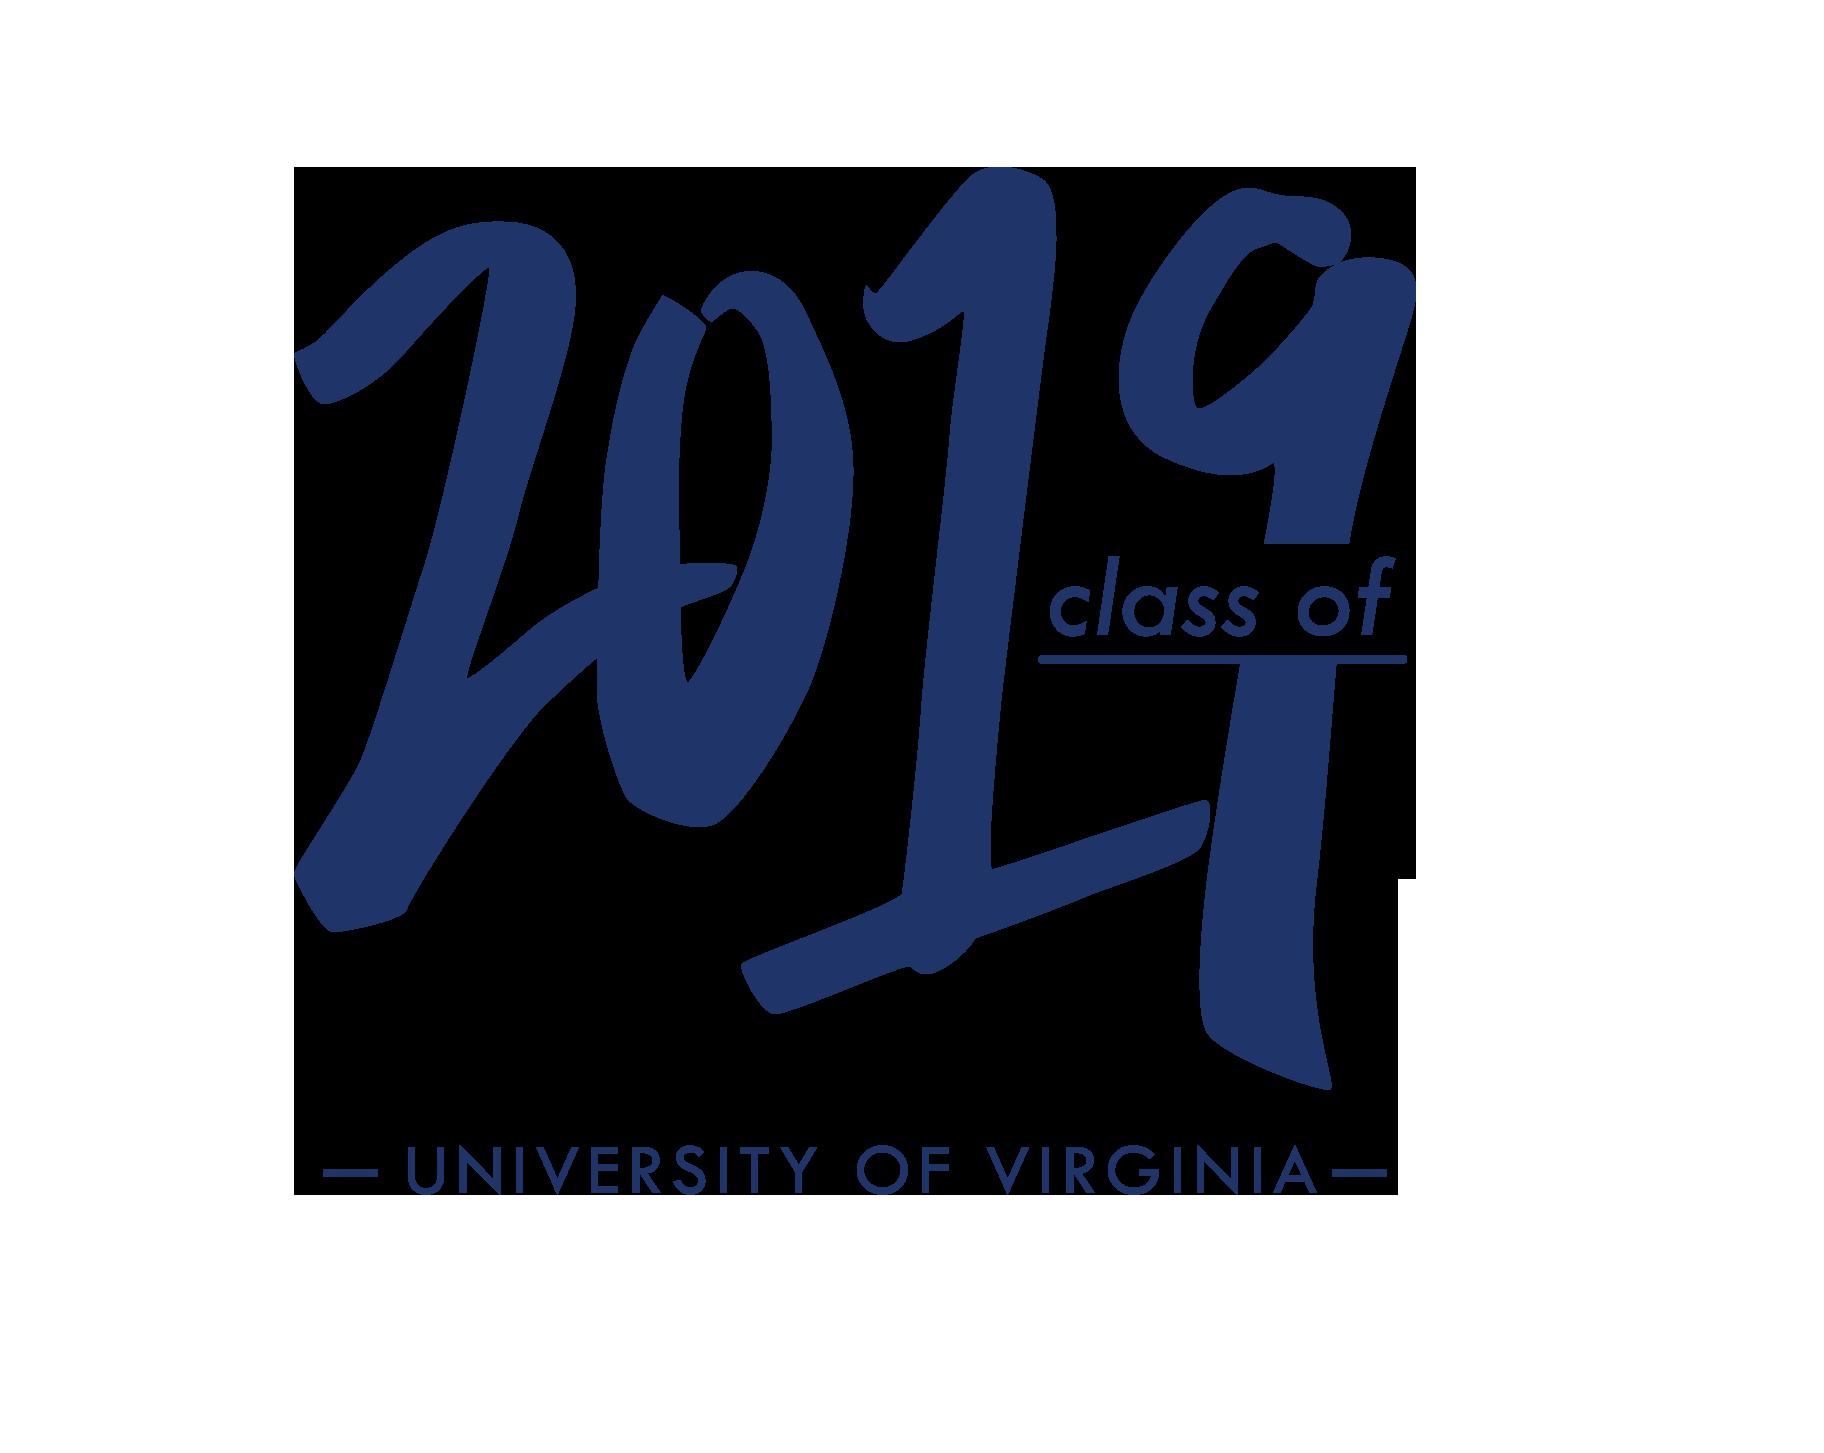 2019 Logo Undocully Training (1).png